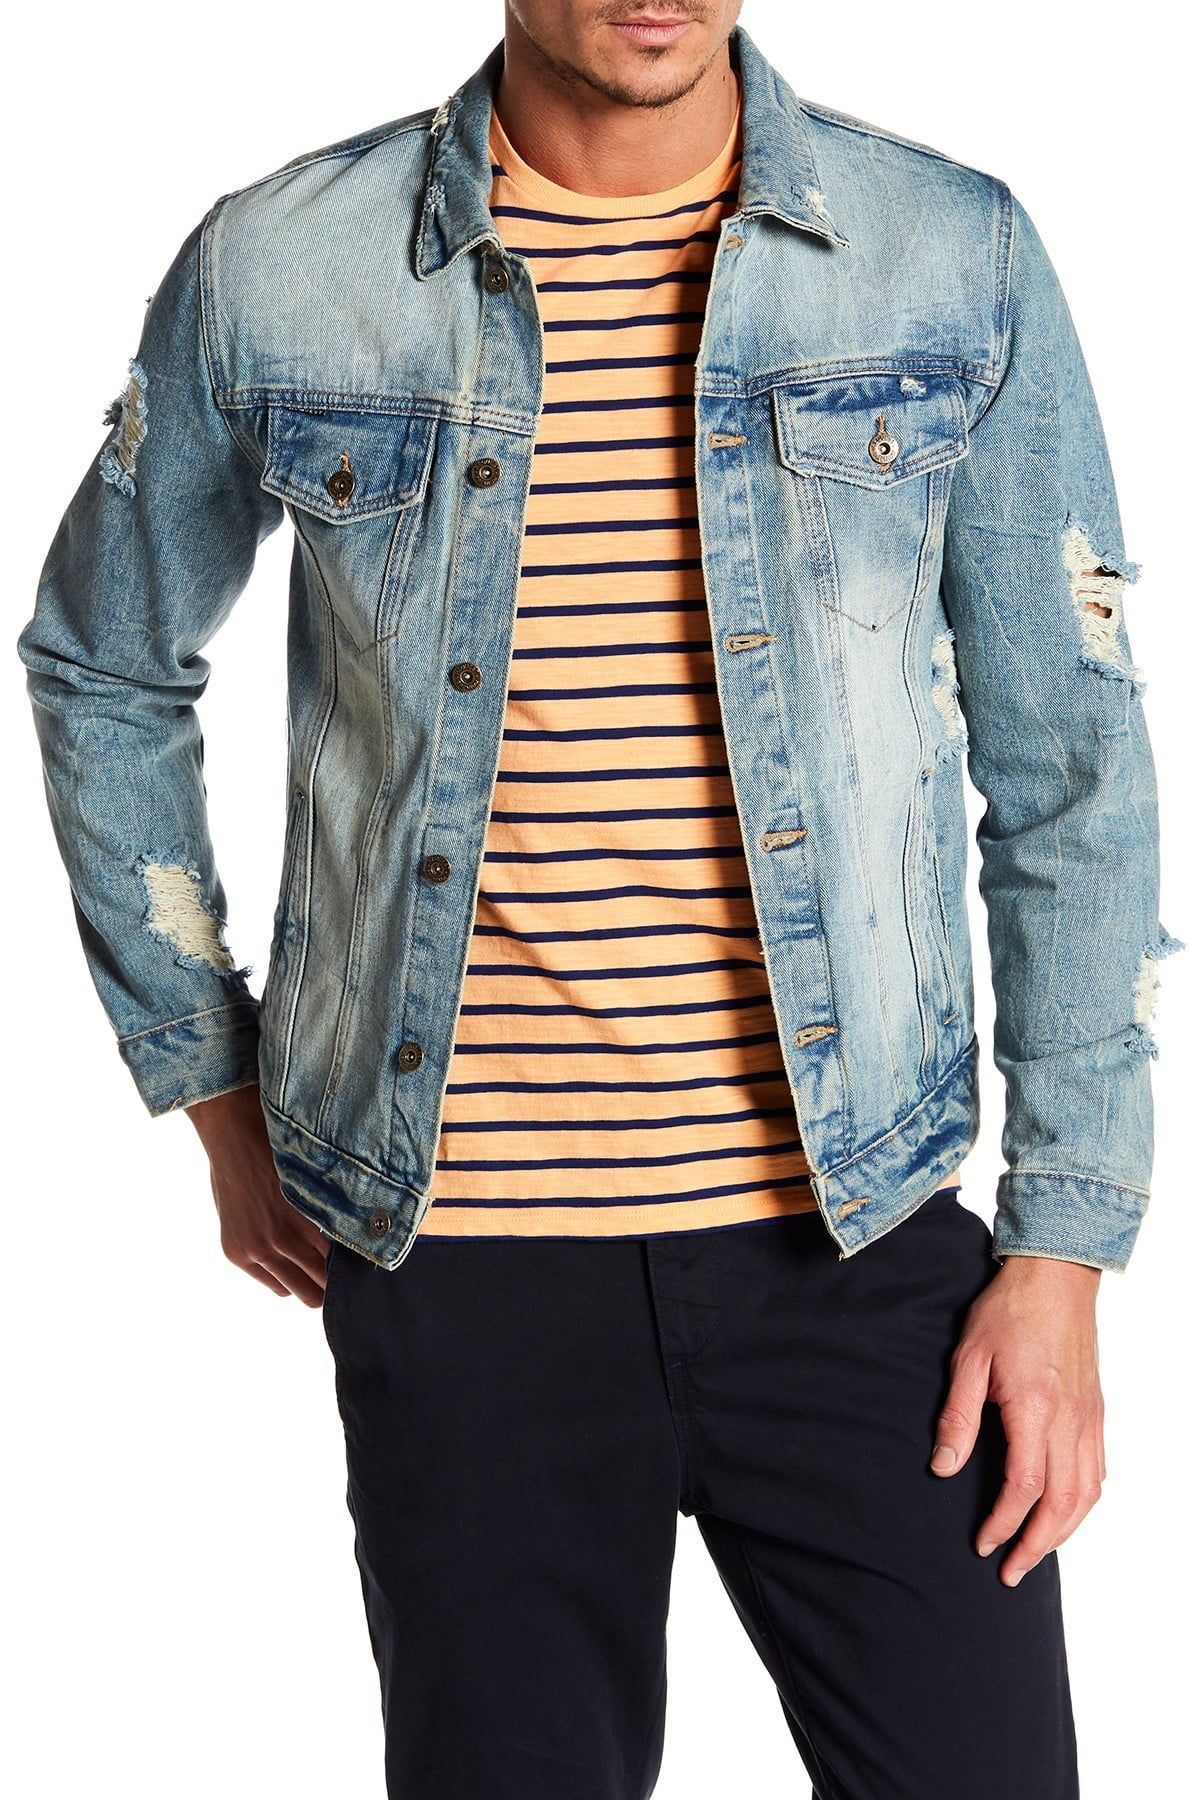 Request Distressed Denim Jacket Nordstrom Rack Jean Jacket Outfits Men Distressed Denim Jacket Denim Jacket [ 1800 x 1200 Pixel ]